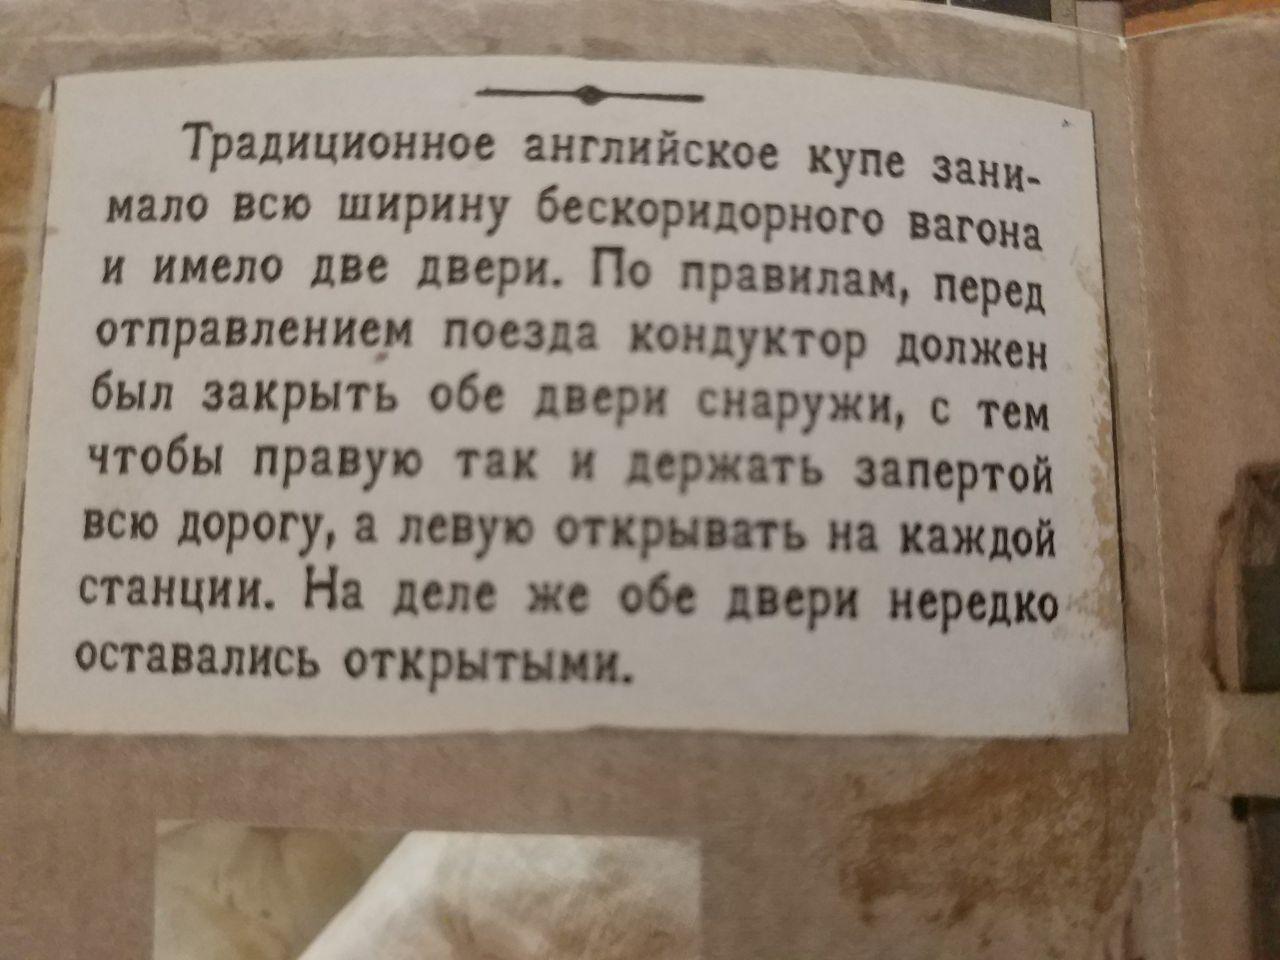 http://s5.uploads.ru/QkzBG.jpg